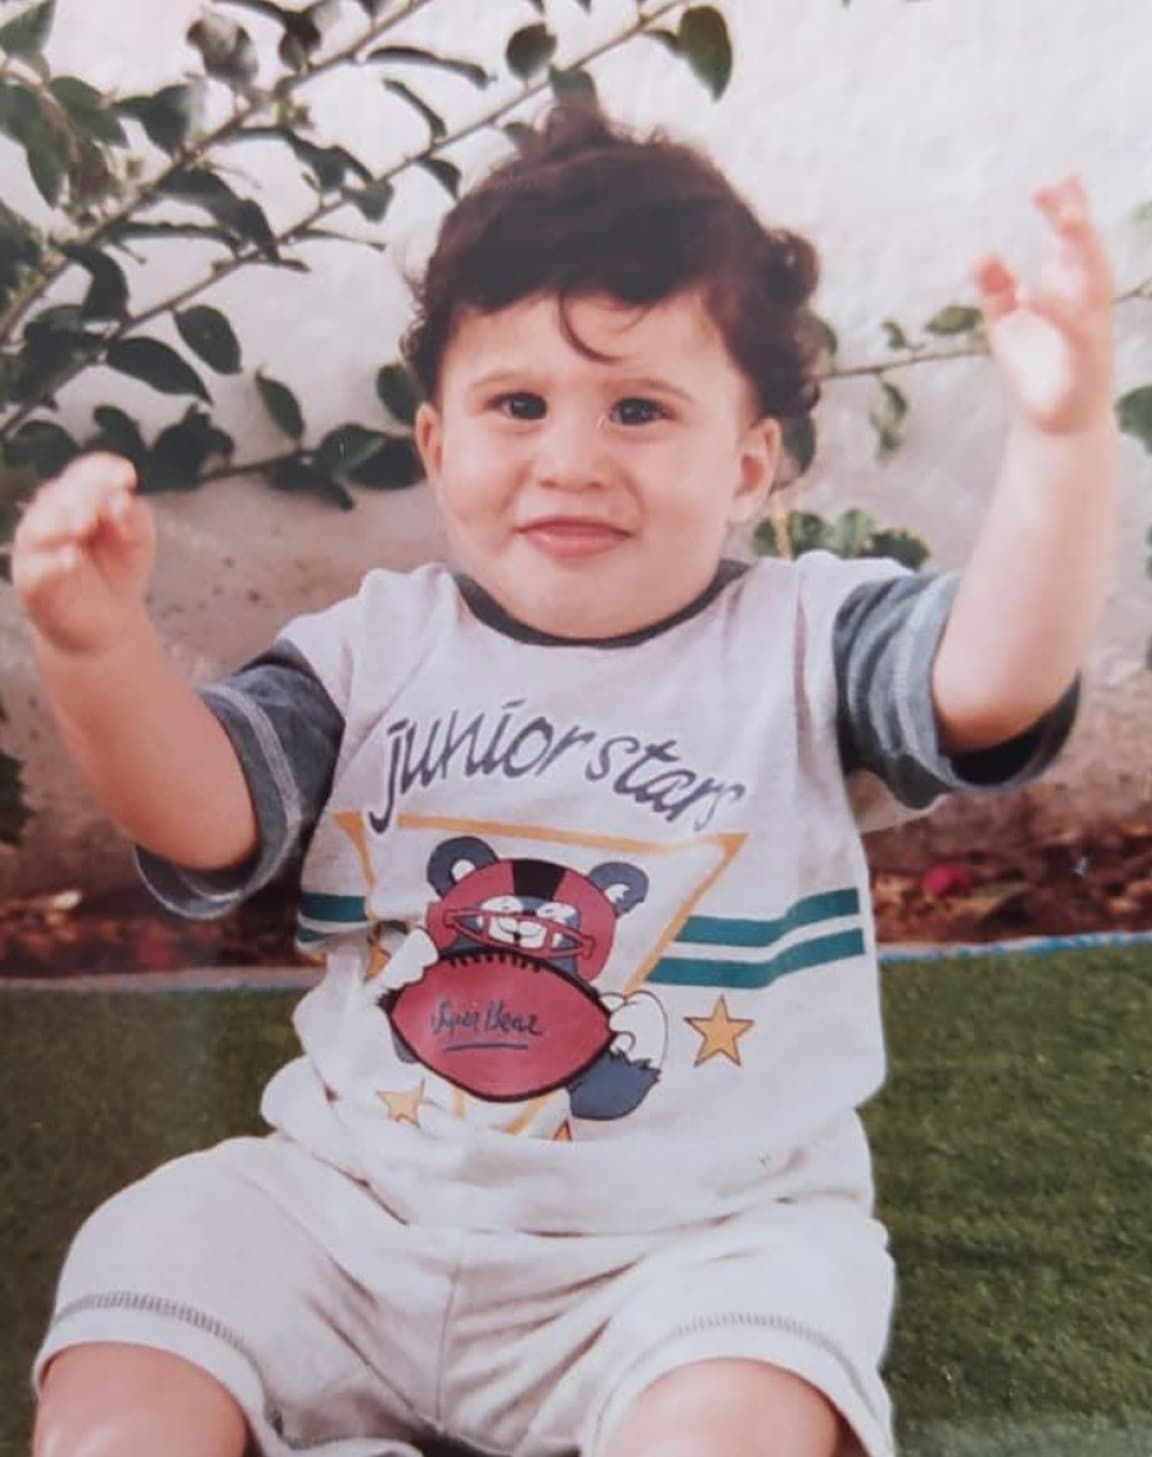 Jorge-baby